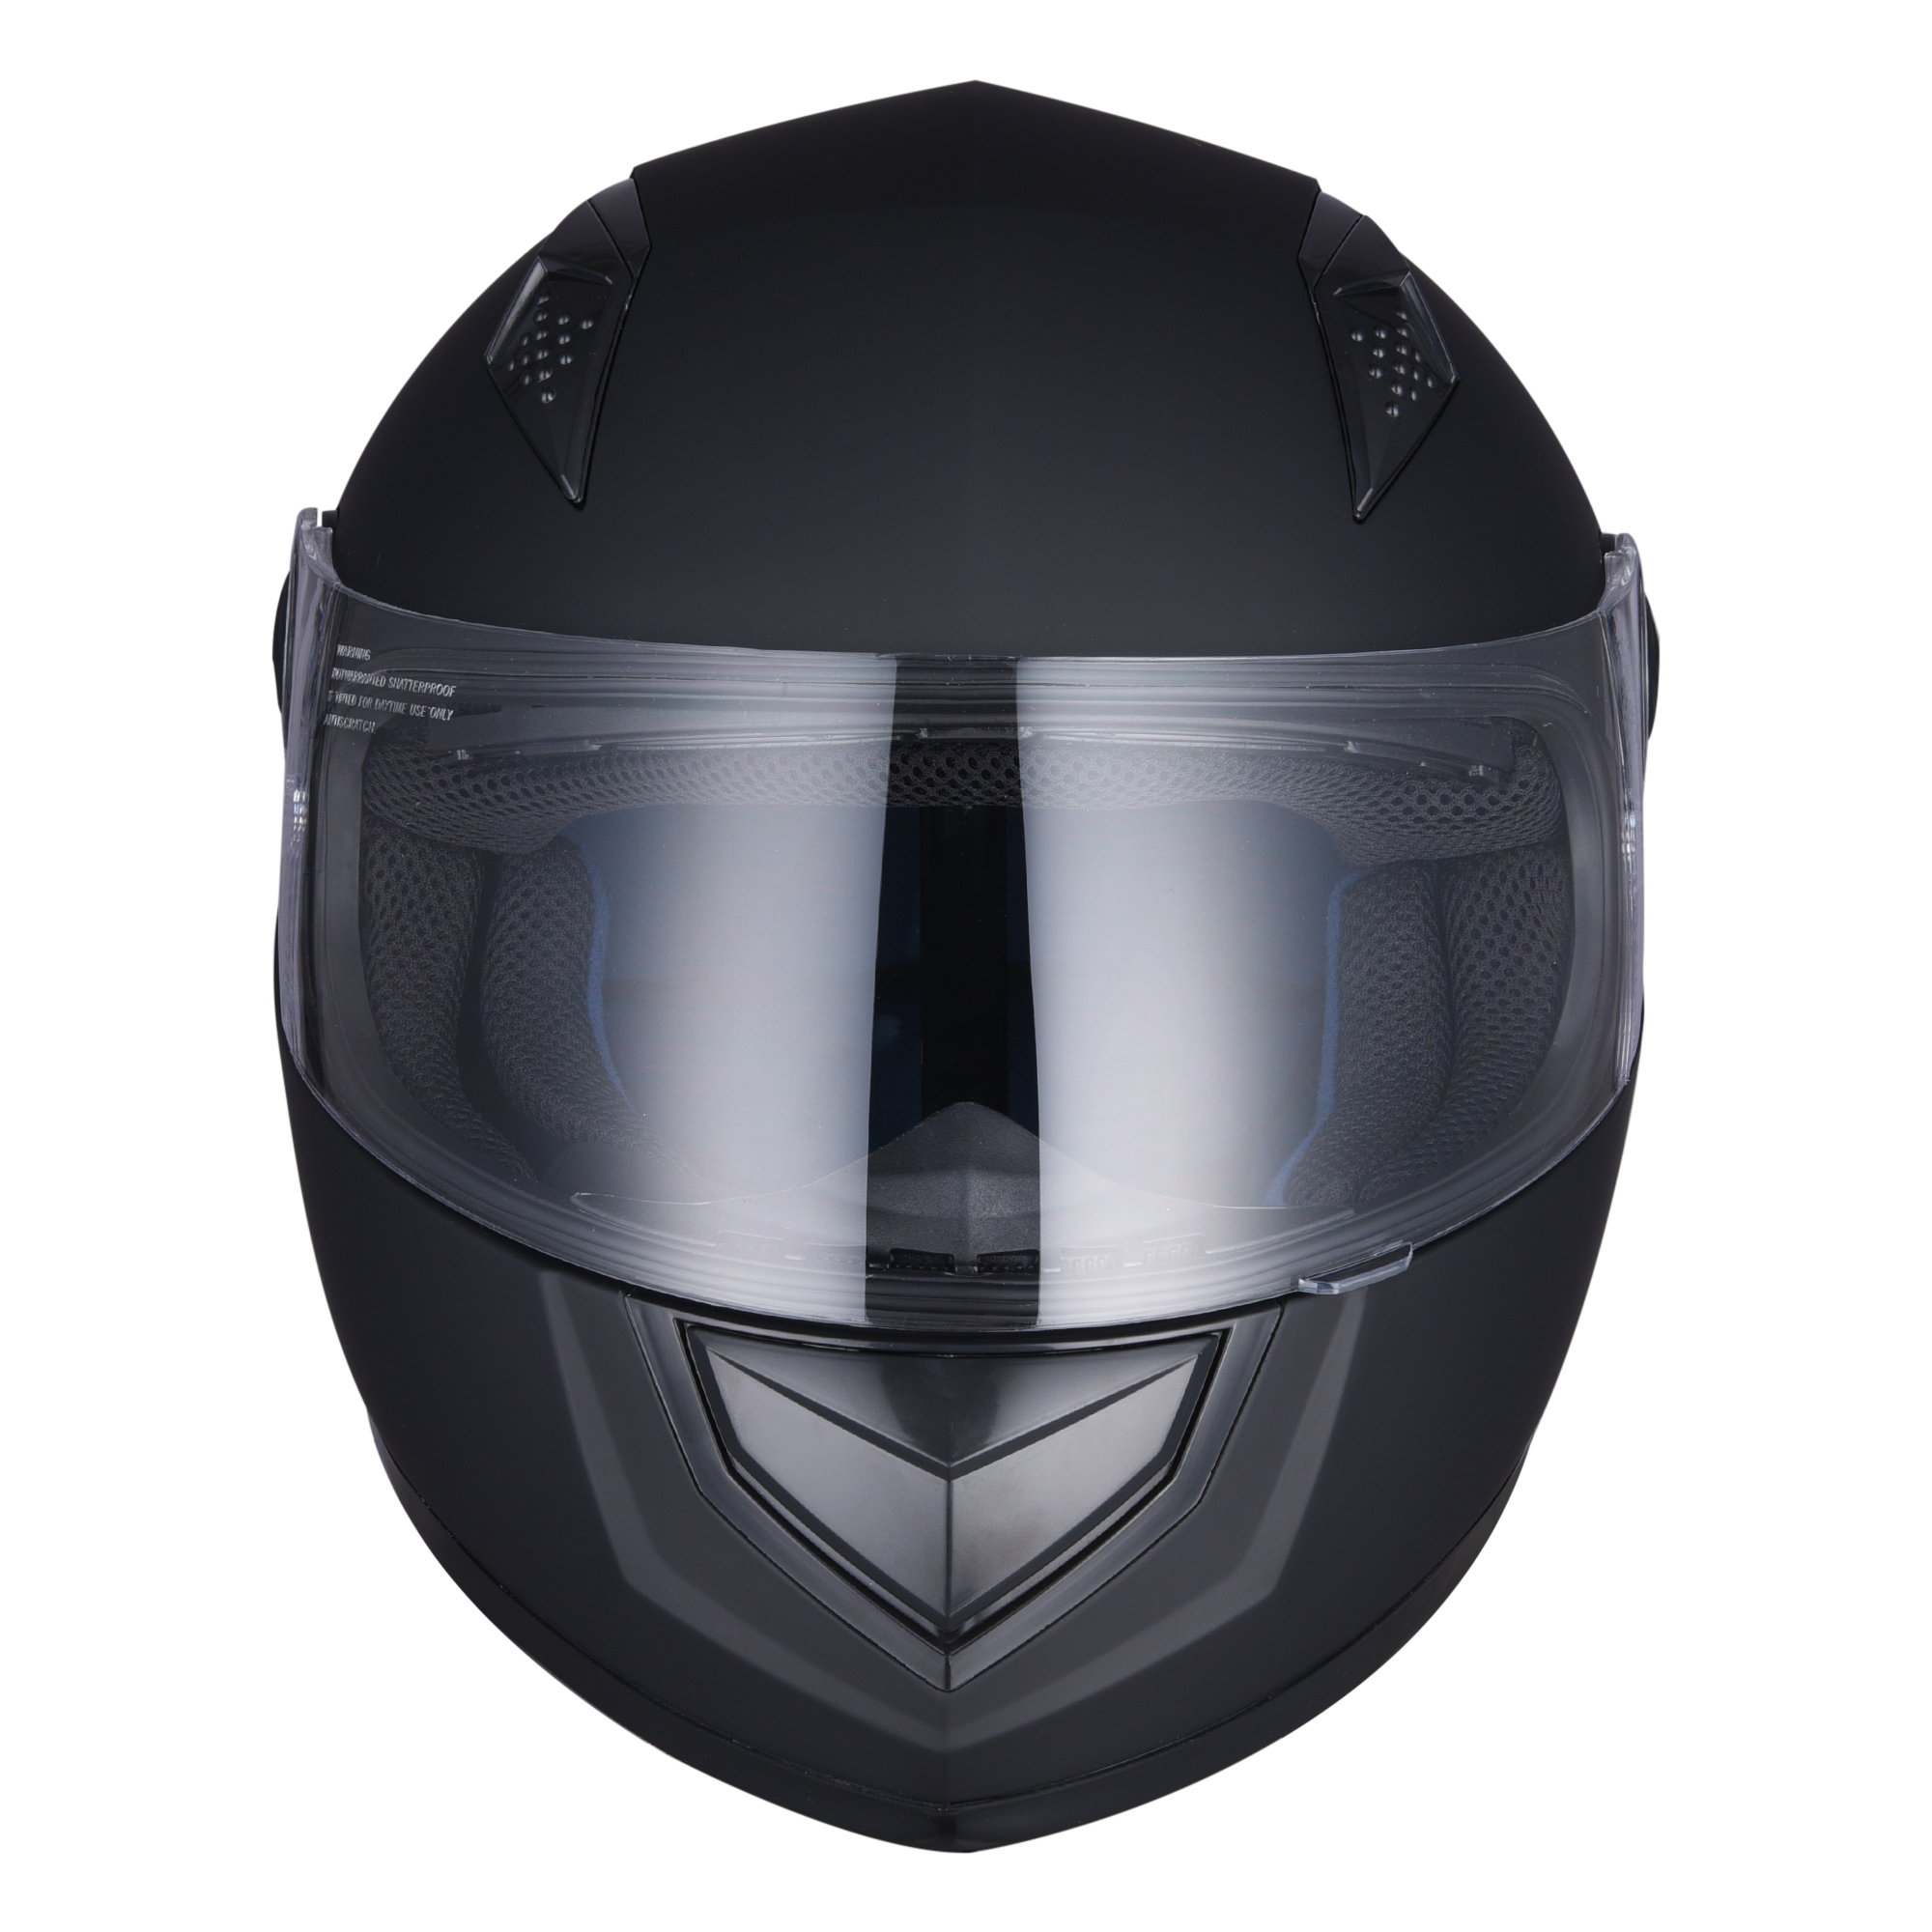 miniature 97 - AHR K12 Full Face Motorcycle Helmet DOT Air Vents Clear Visor Racing S M L XL